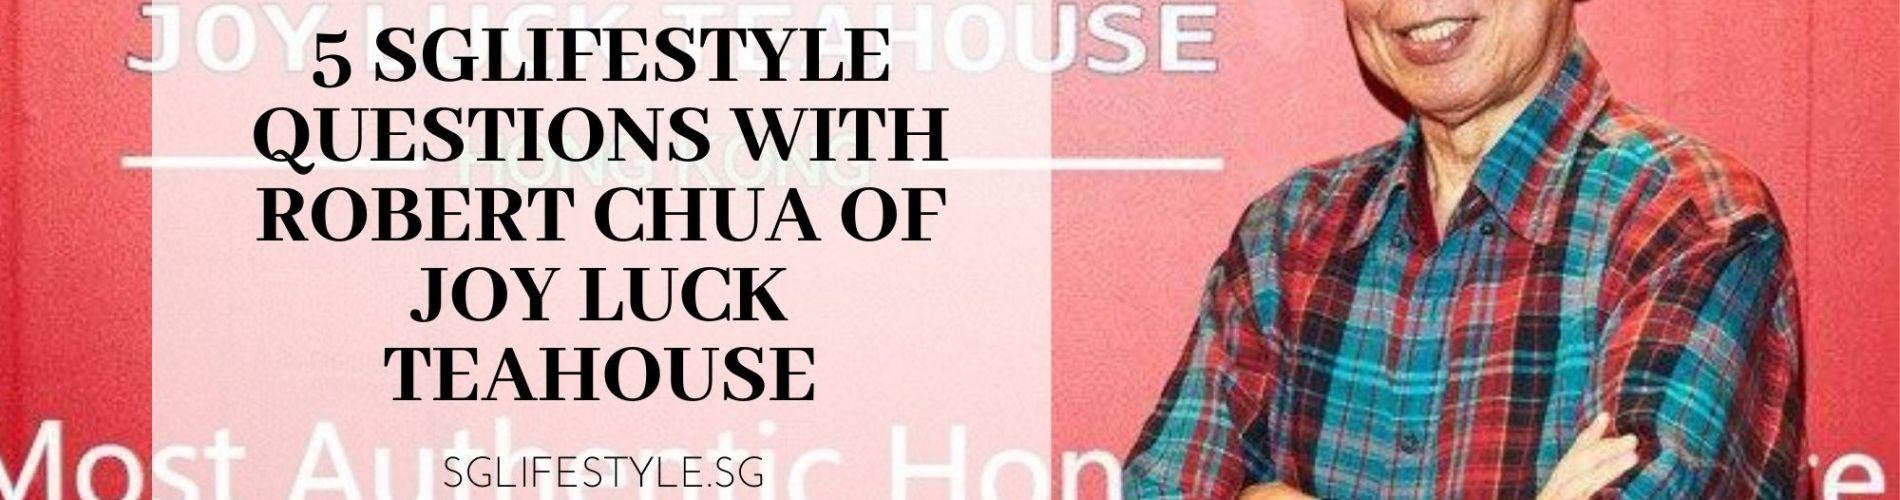 sglifestylesg robert chua joy luck teahouse